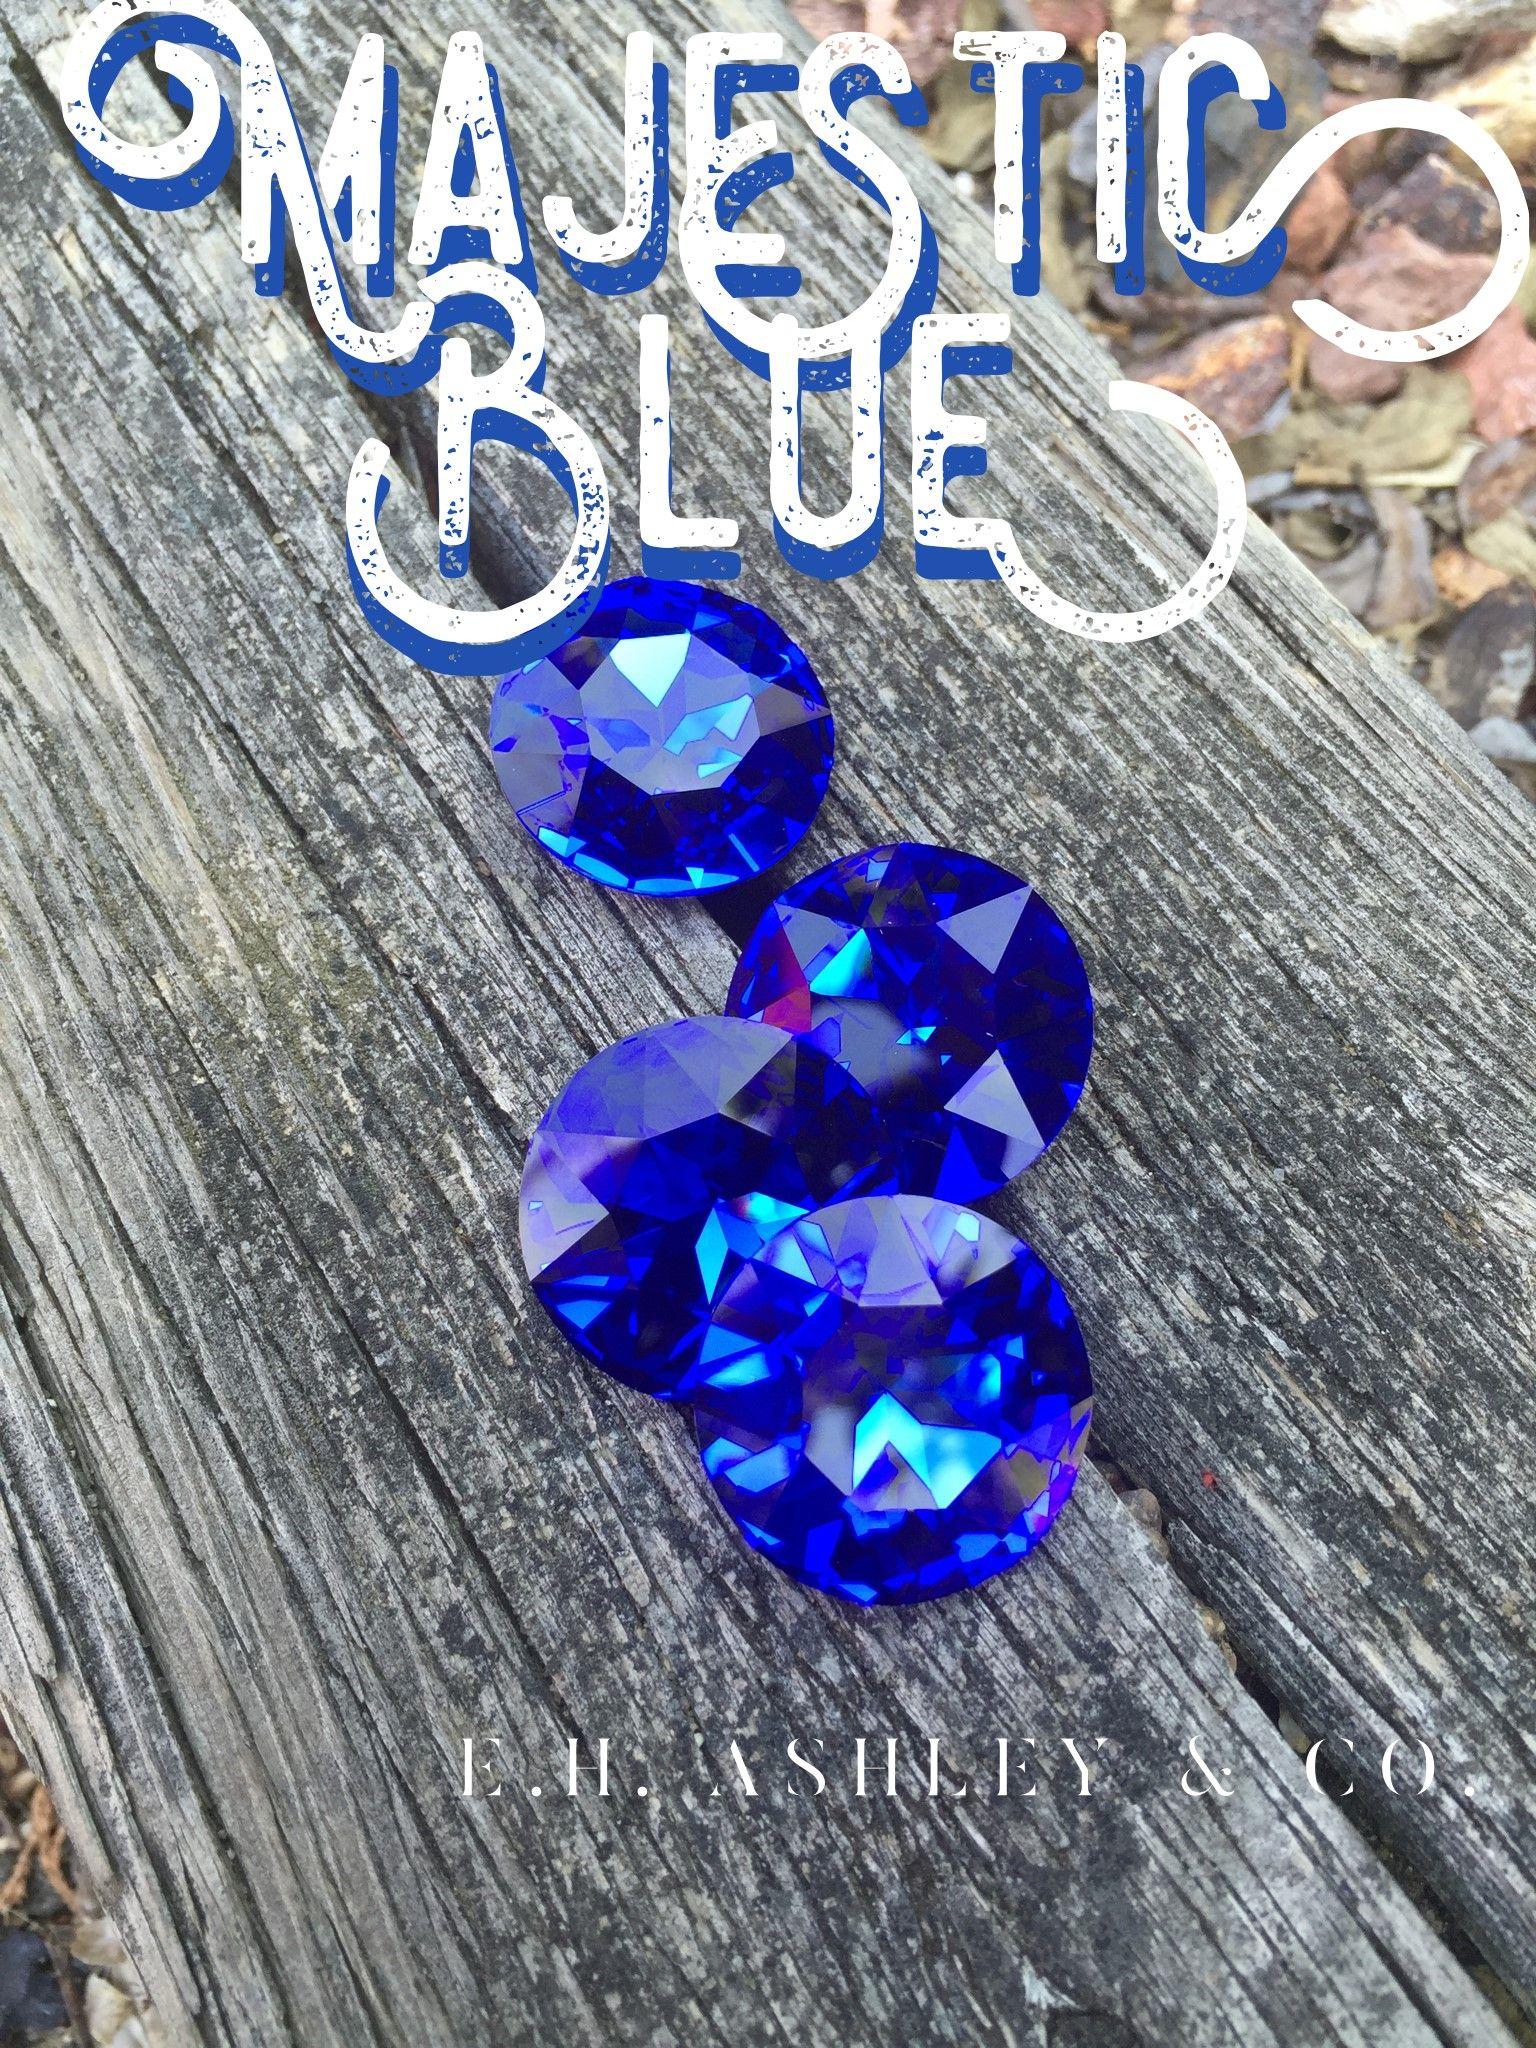 b3f9f07c0 1201 Majestic Blue F 27mm - Special Production - www.ehashley.com  #specialproduction #limitededition #swarovski #customcoating #1201 #27mm  #majesticblue